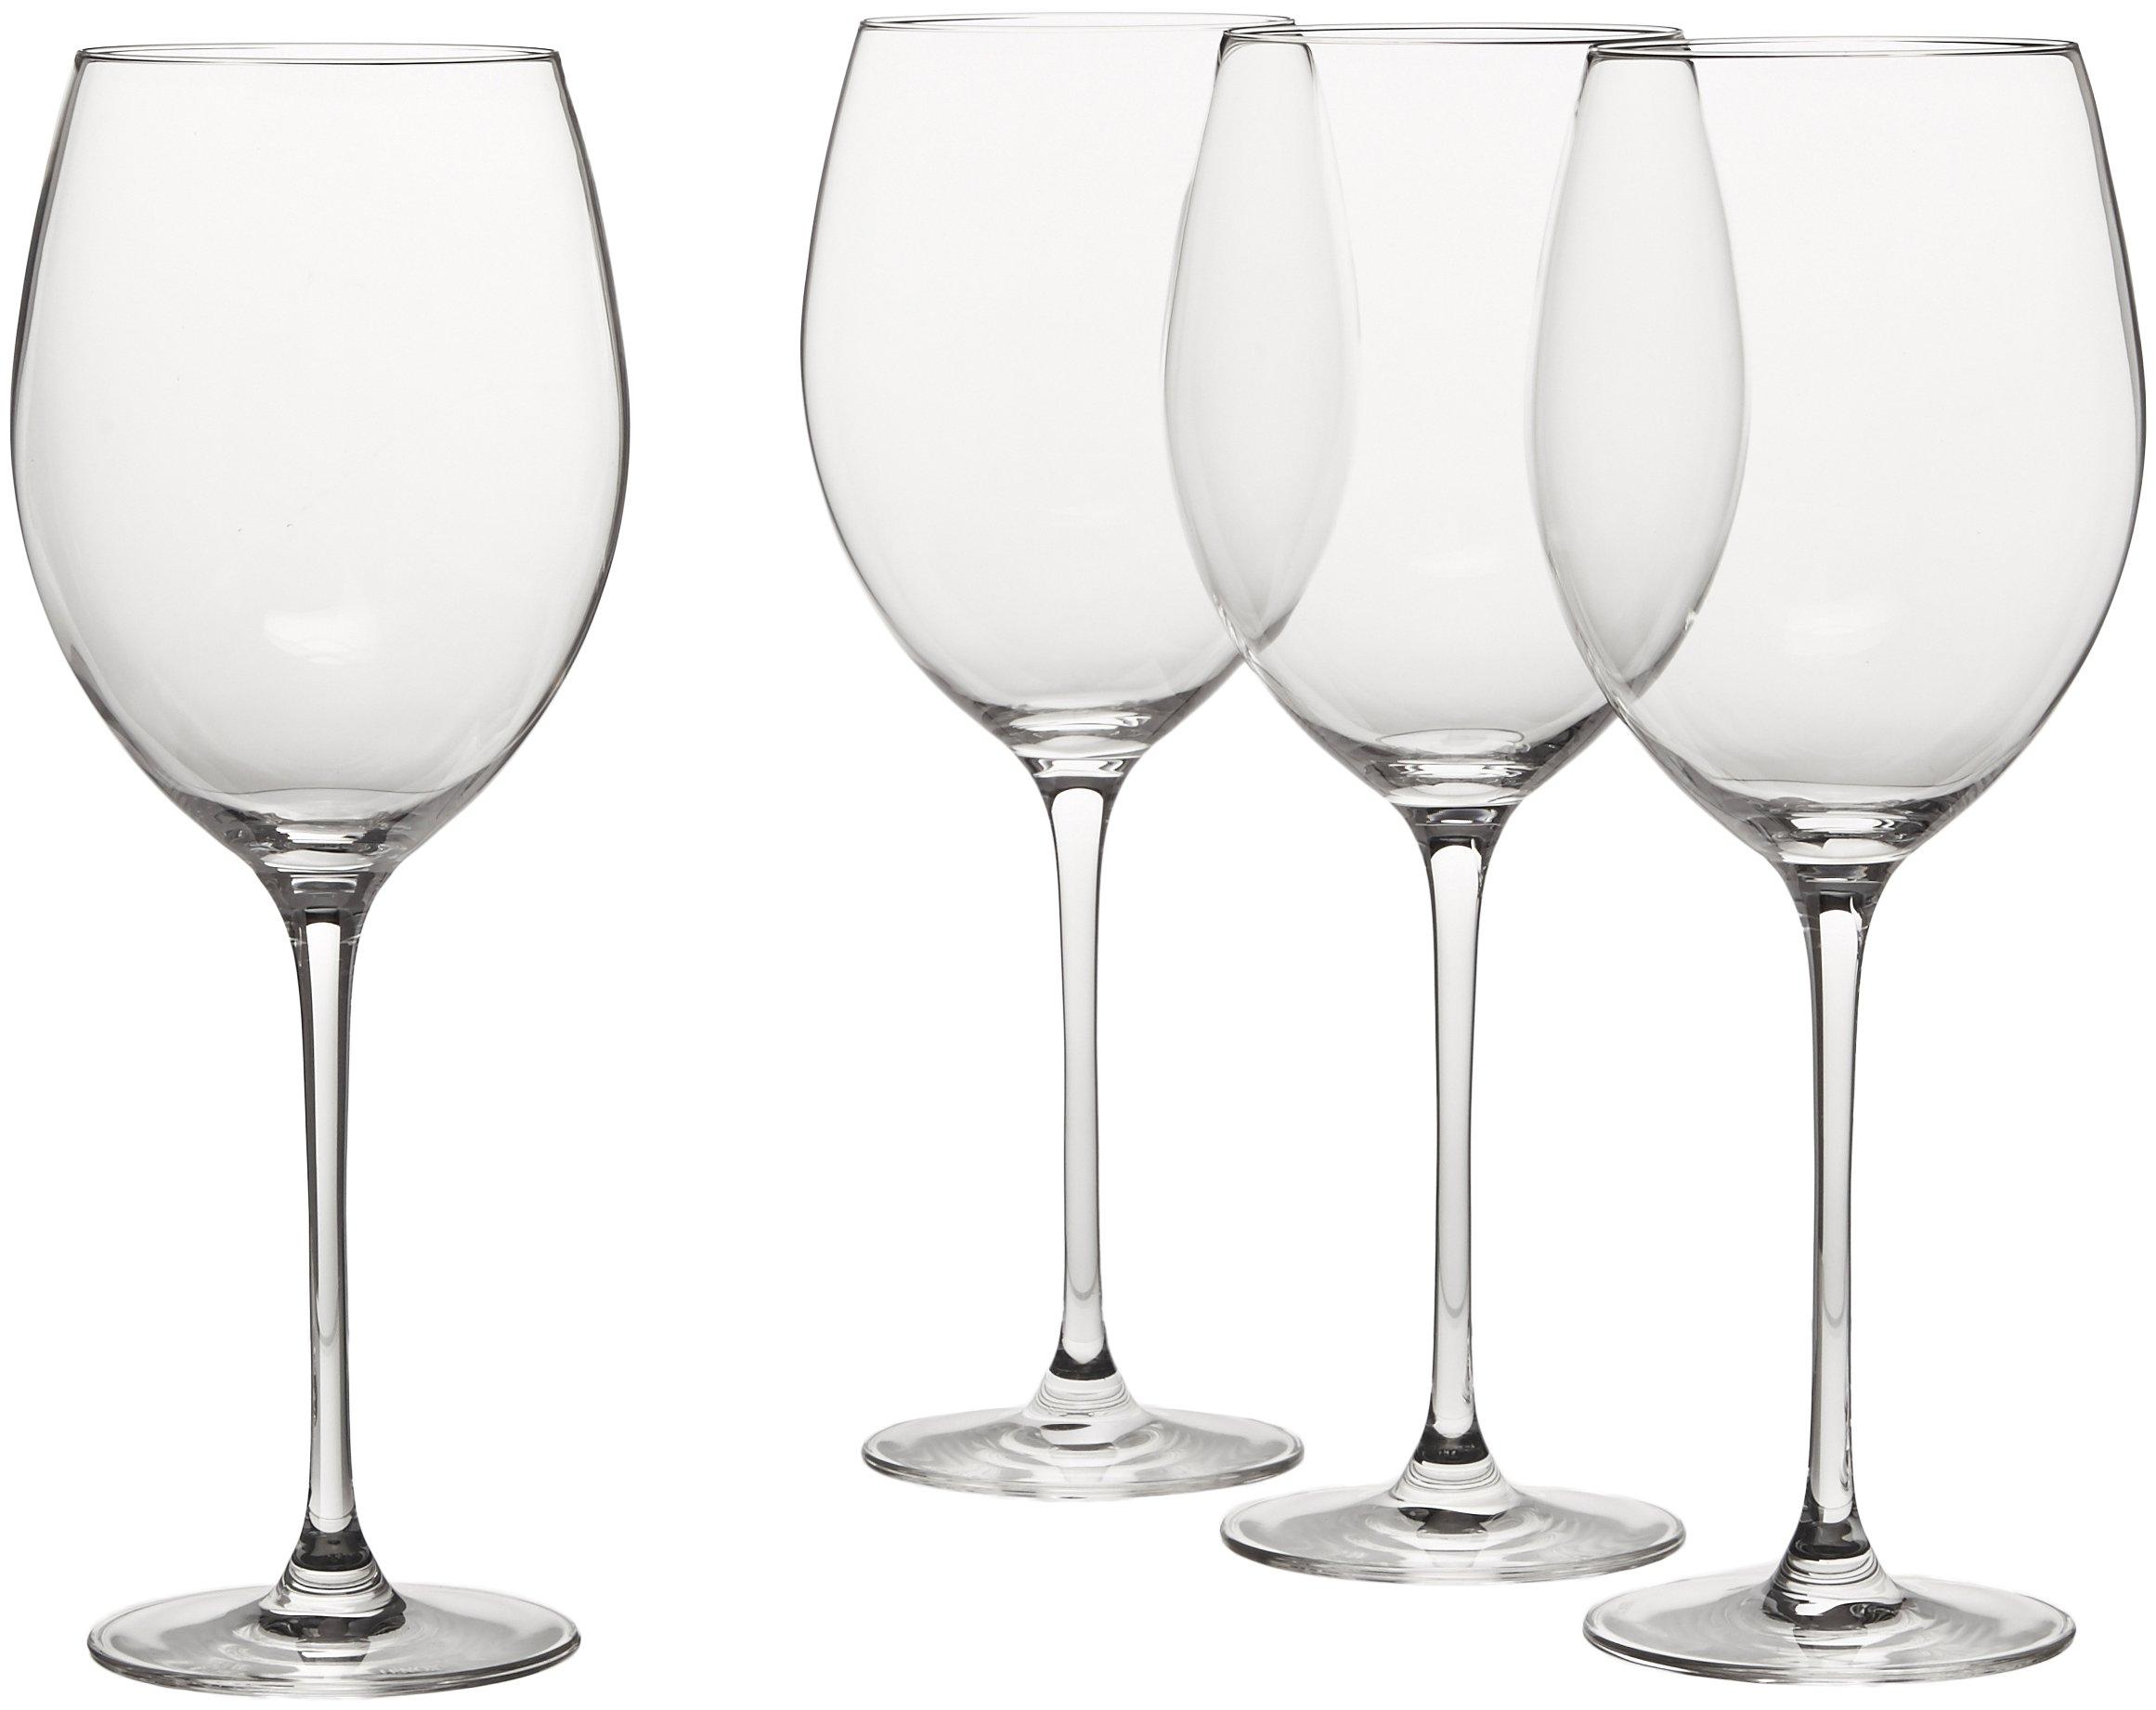 Lenox Tuscany Classics Grand Bordeaux, Set of 4